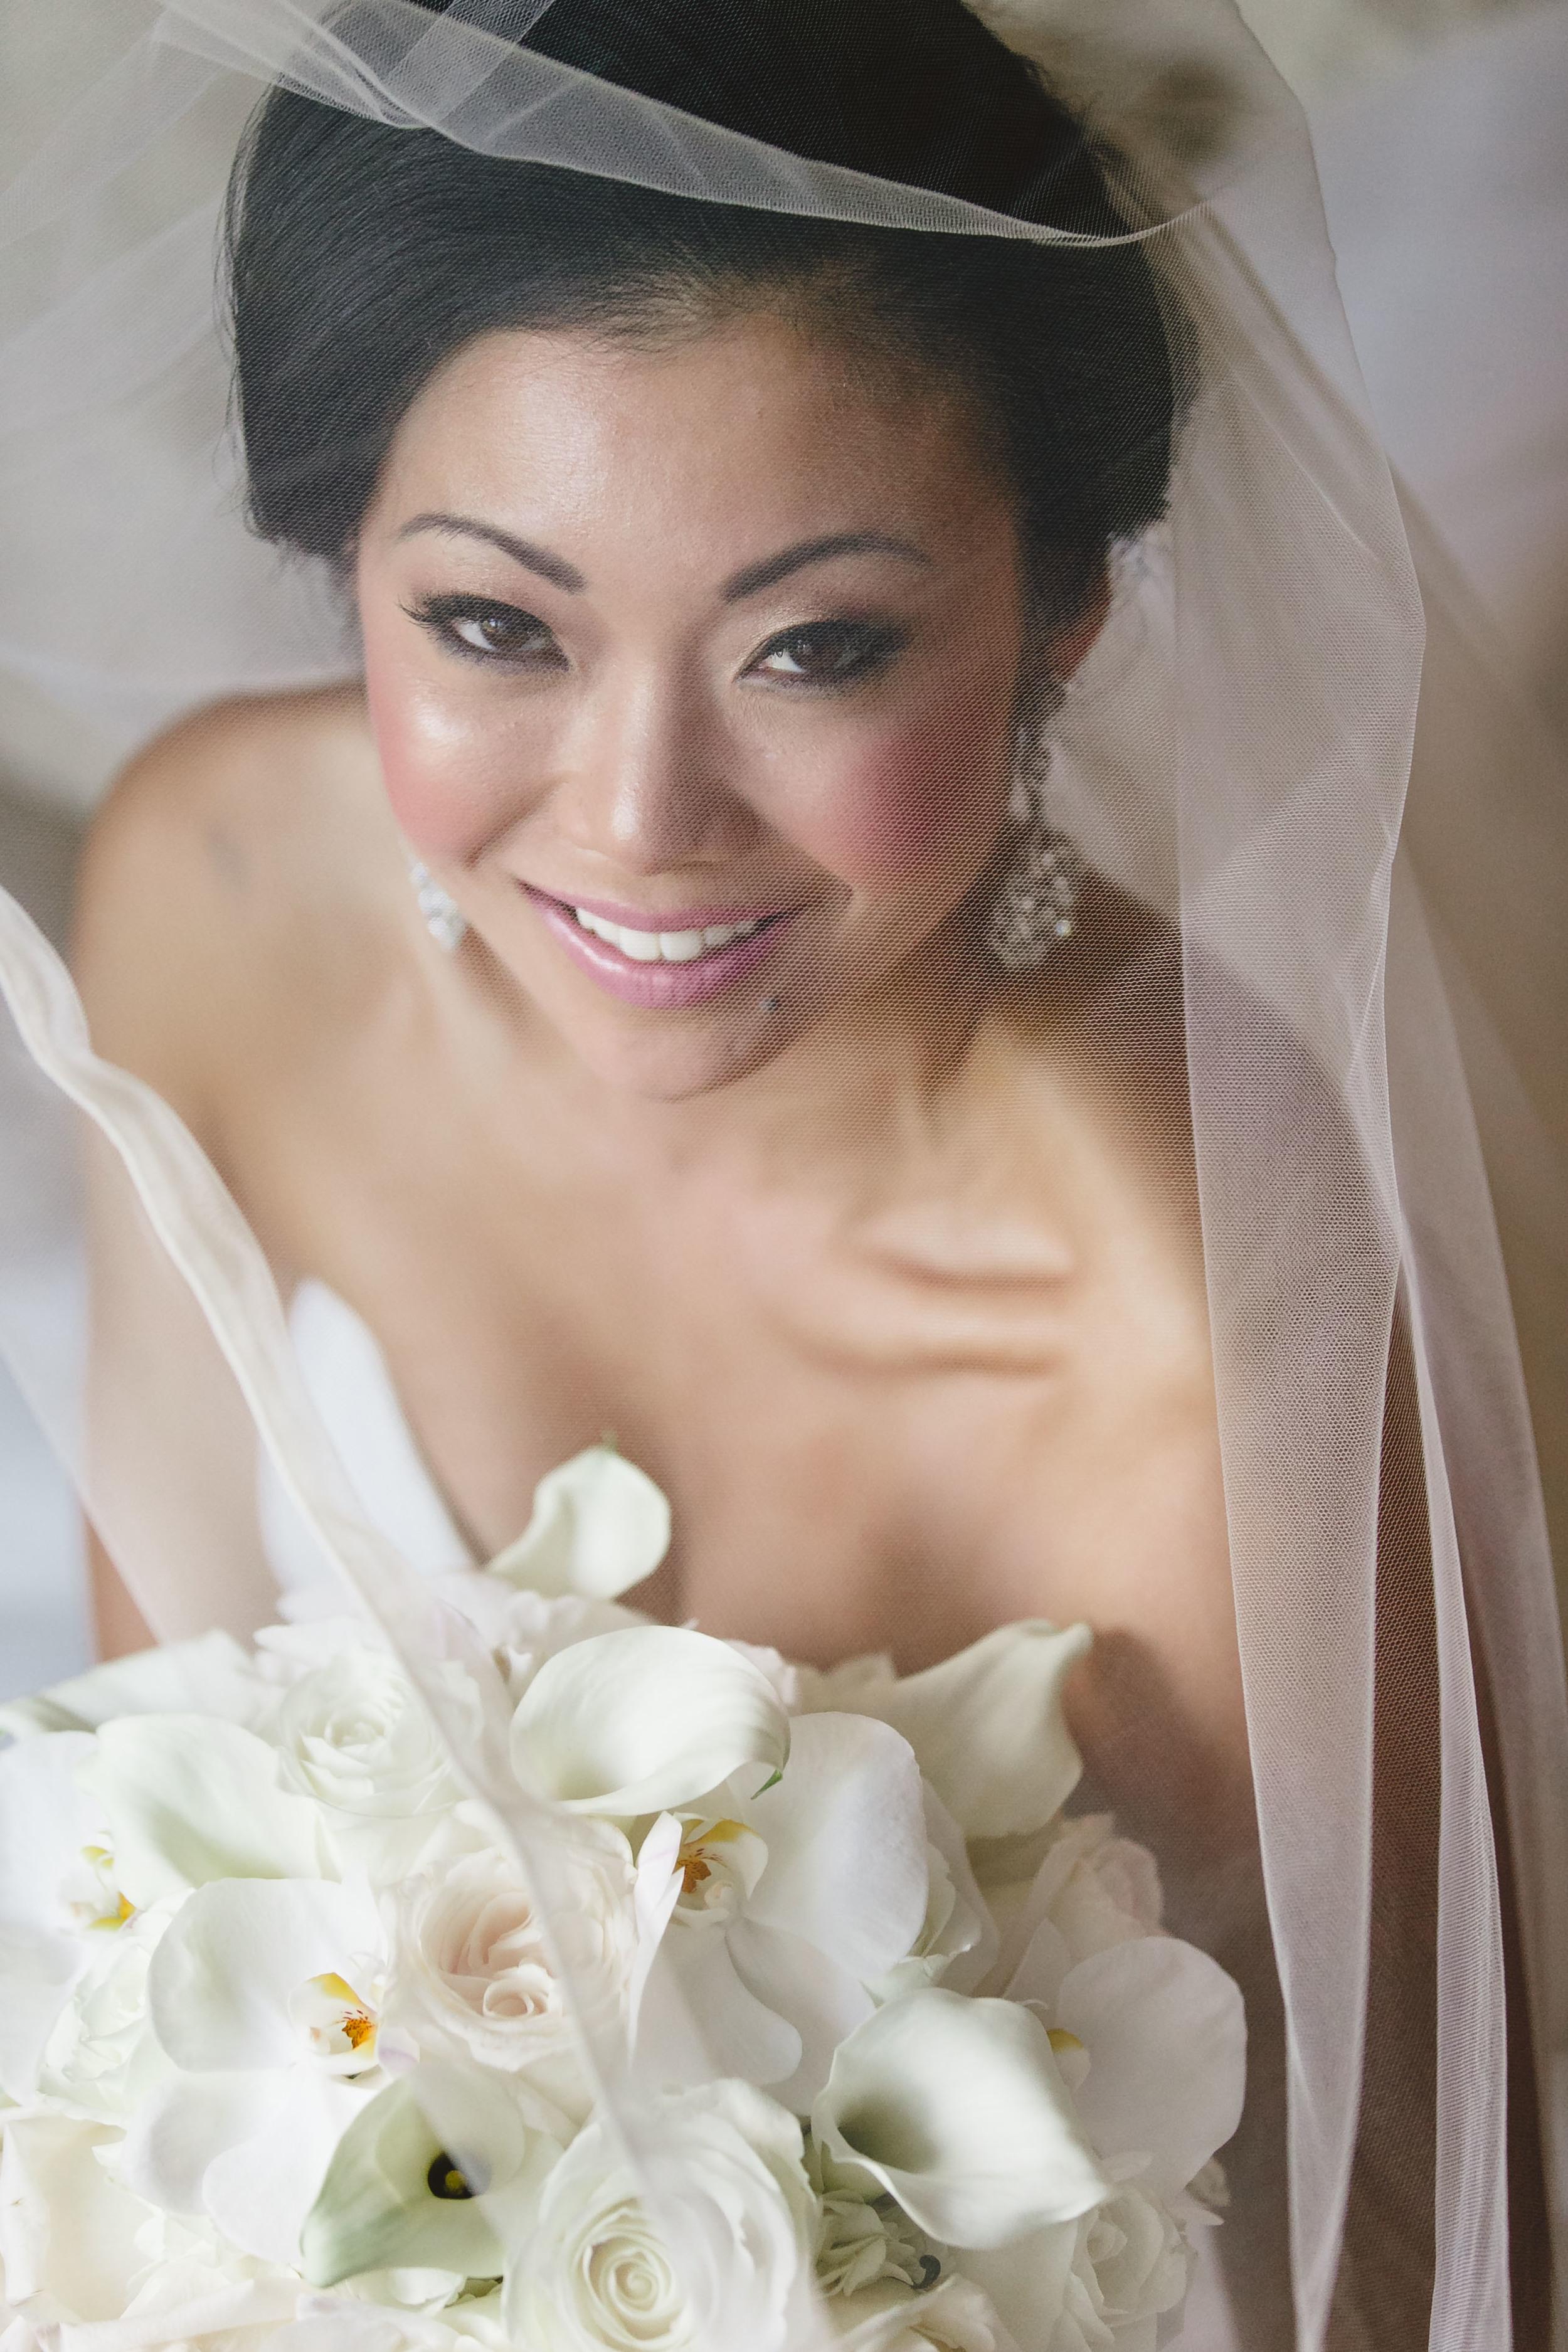 Luxurious-Chinese-Italian-Wedding-Pleasantdale-Chateau-West-Orange-New-Jersey-Photojournalisti-Wedding-Photography-Jacek-Dolata-19.jpg